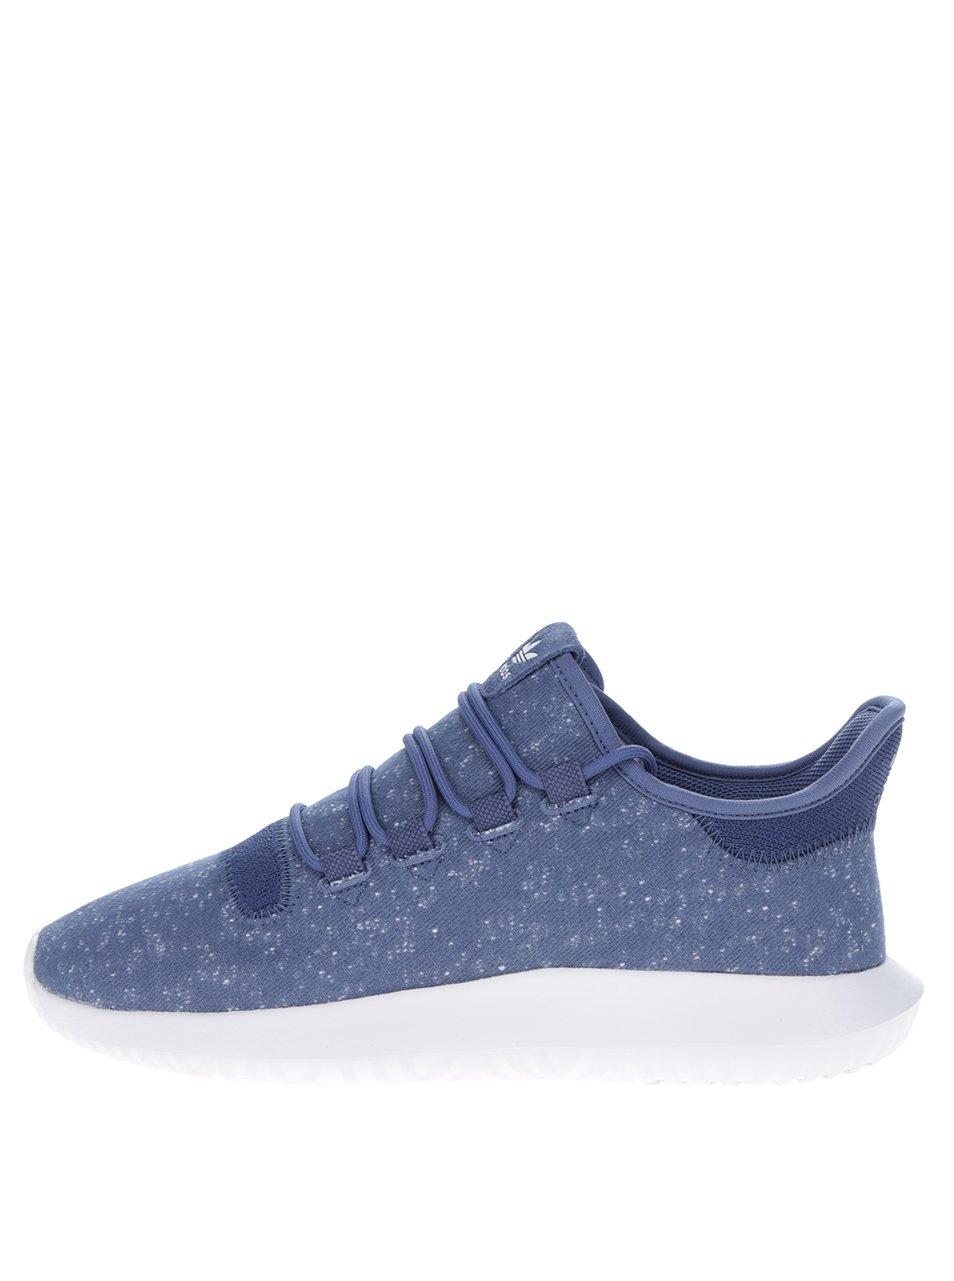 Modré žíhané pánské tenisky adidas Originals Tubular Shadow